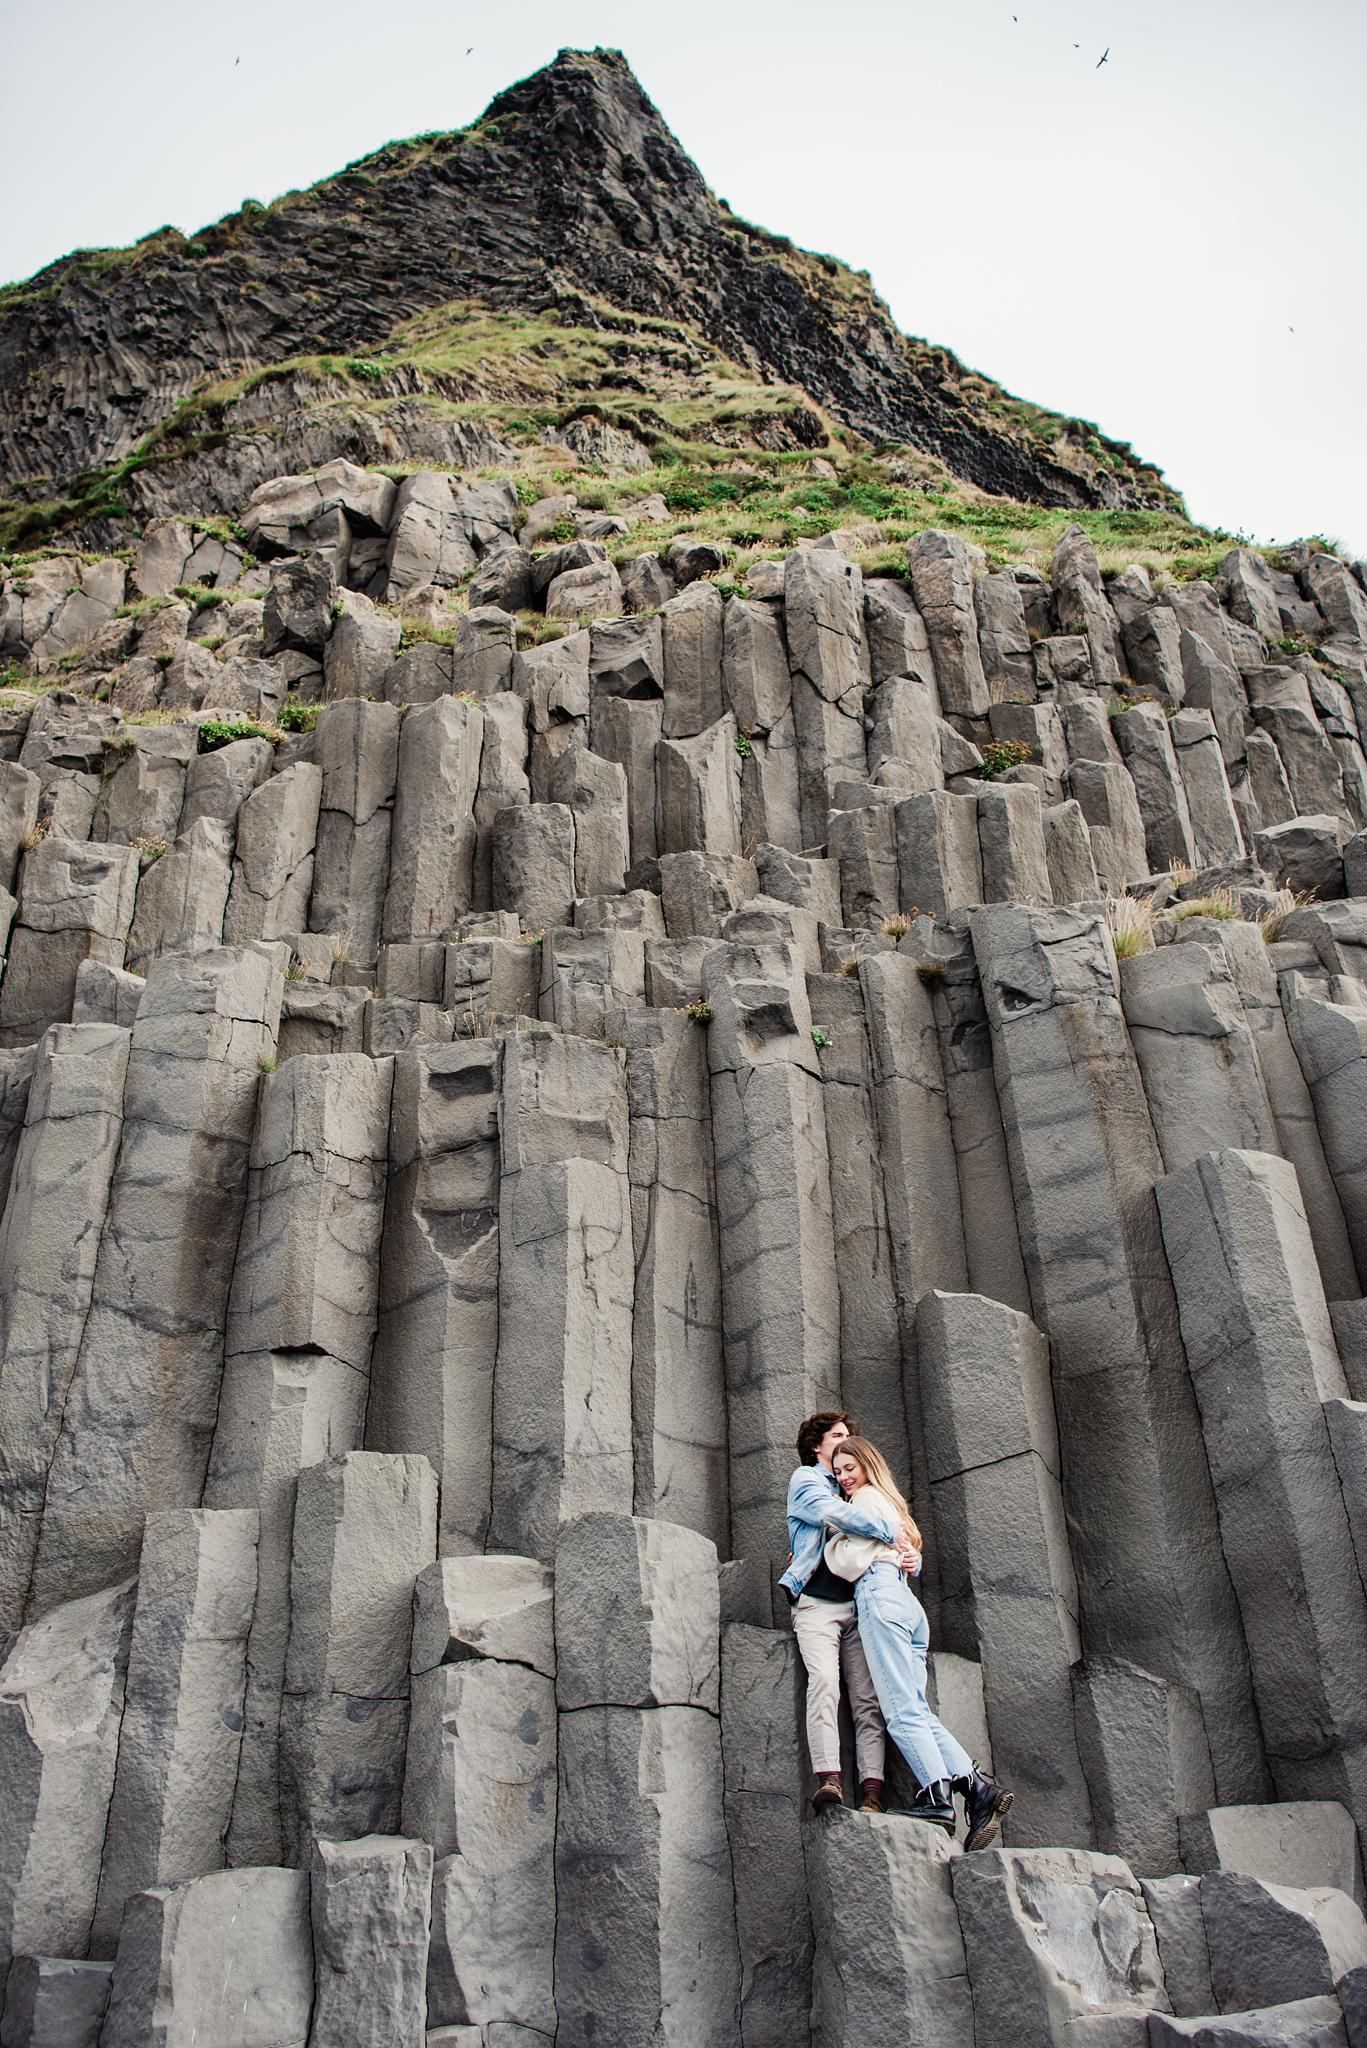 Iceland_Reynisfjara_Black_Sand_Beach_Couples_Session_JILL_STUDIO_Rochester_NY_Photographer_DSC_9754.jpg